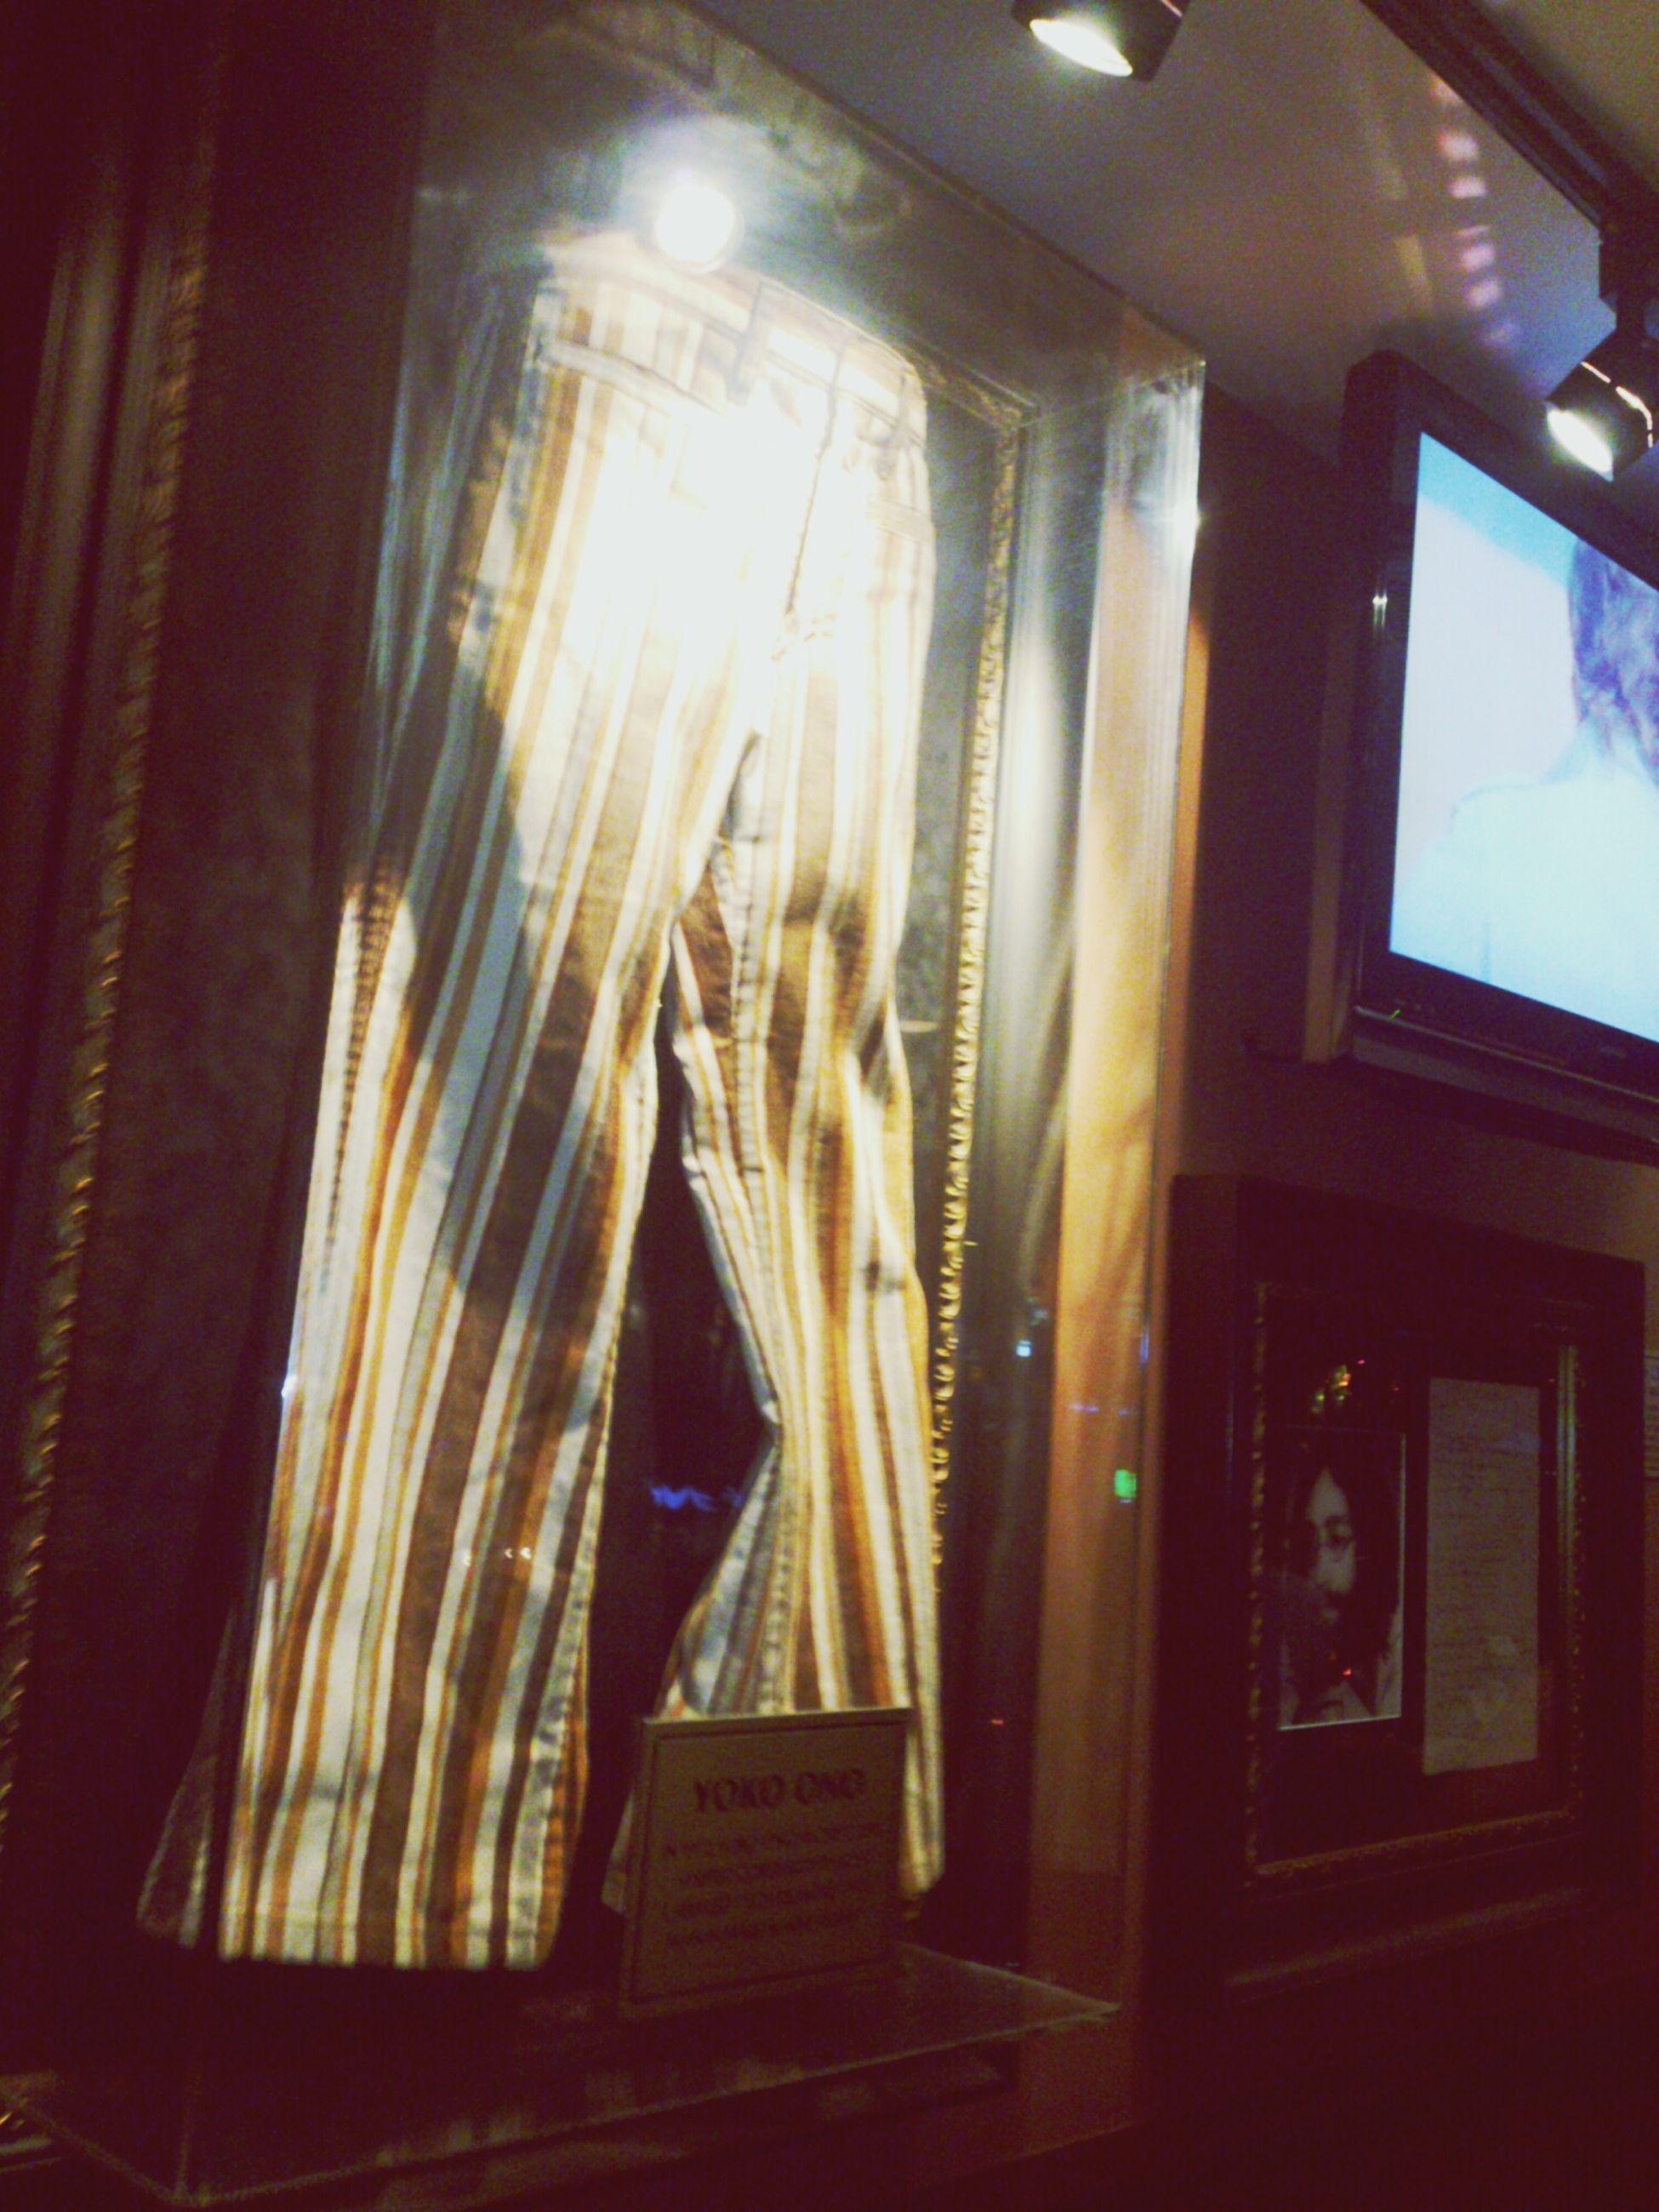 indoors, illuminated, window, glass - material, home interior, transparent, no people, curtain, lighting equipment, close-up, art and craft, human representation, hanging, door, art, light - natural phenomenon, house, pattern, reflection, open